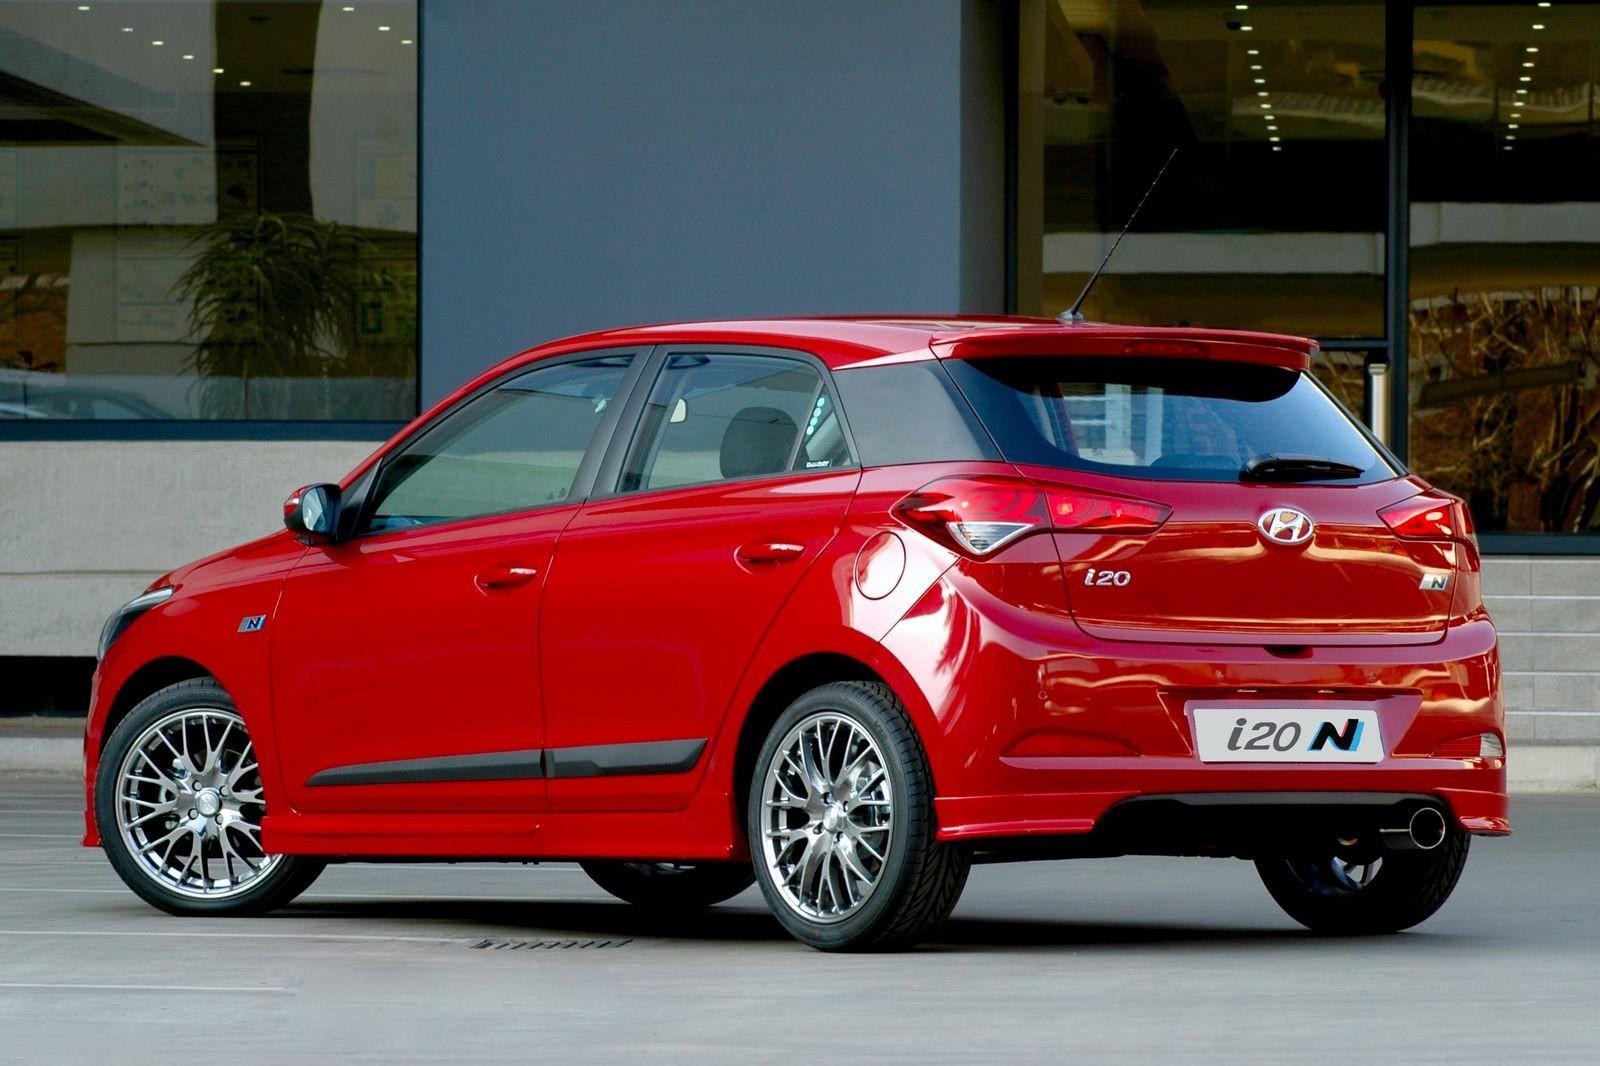 Hyundai i20 N для рынка ЮАР